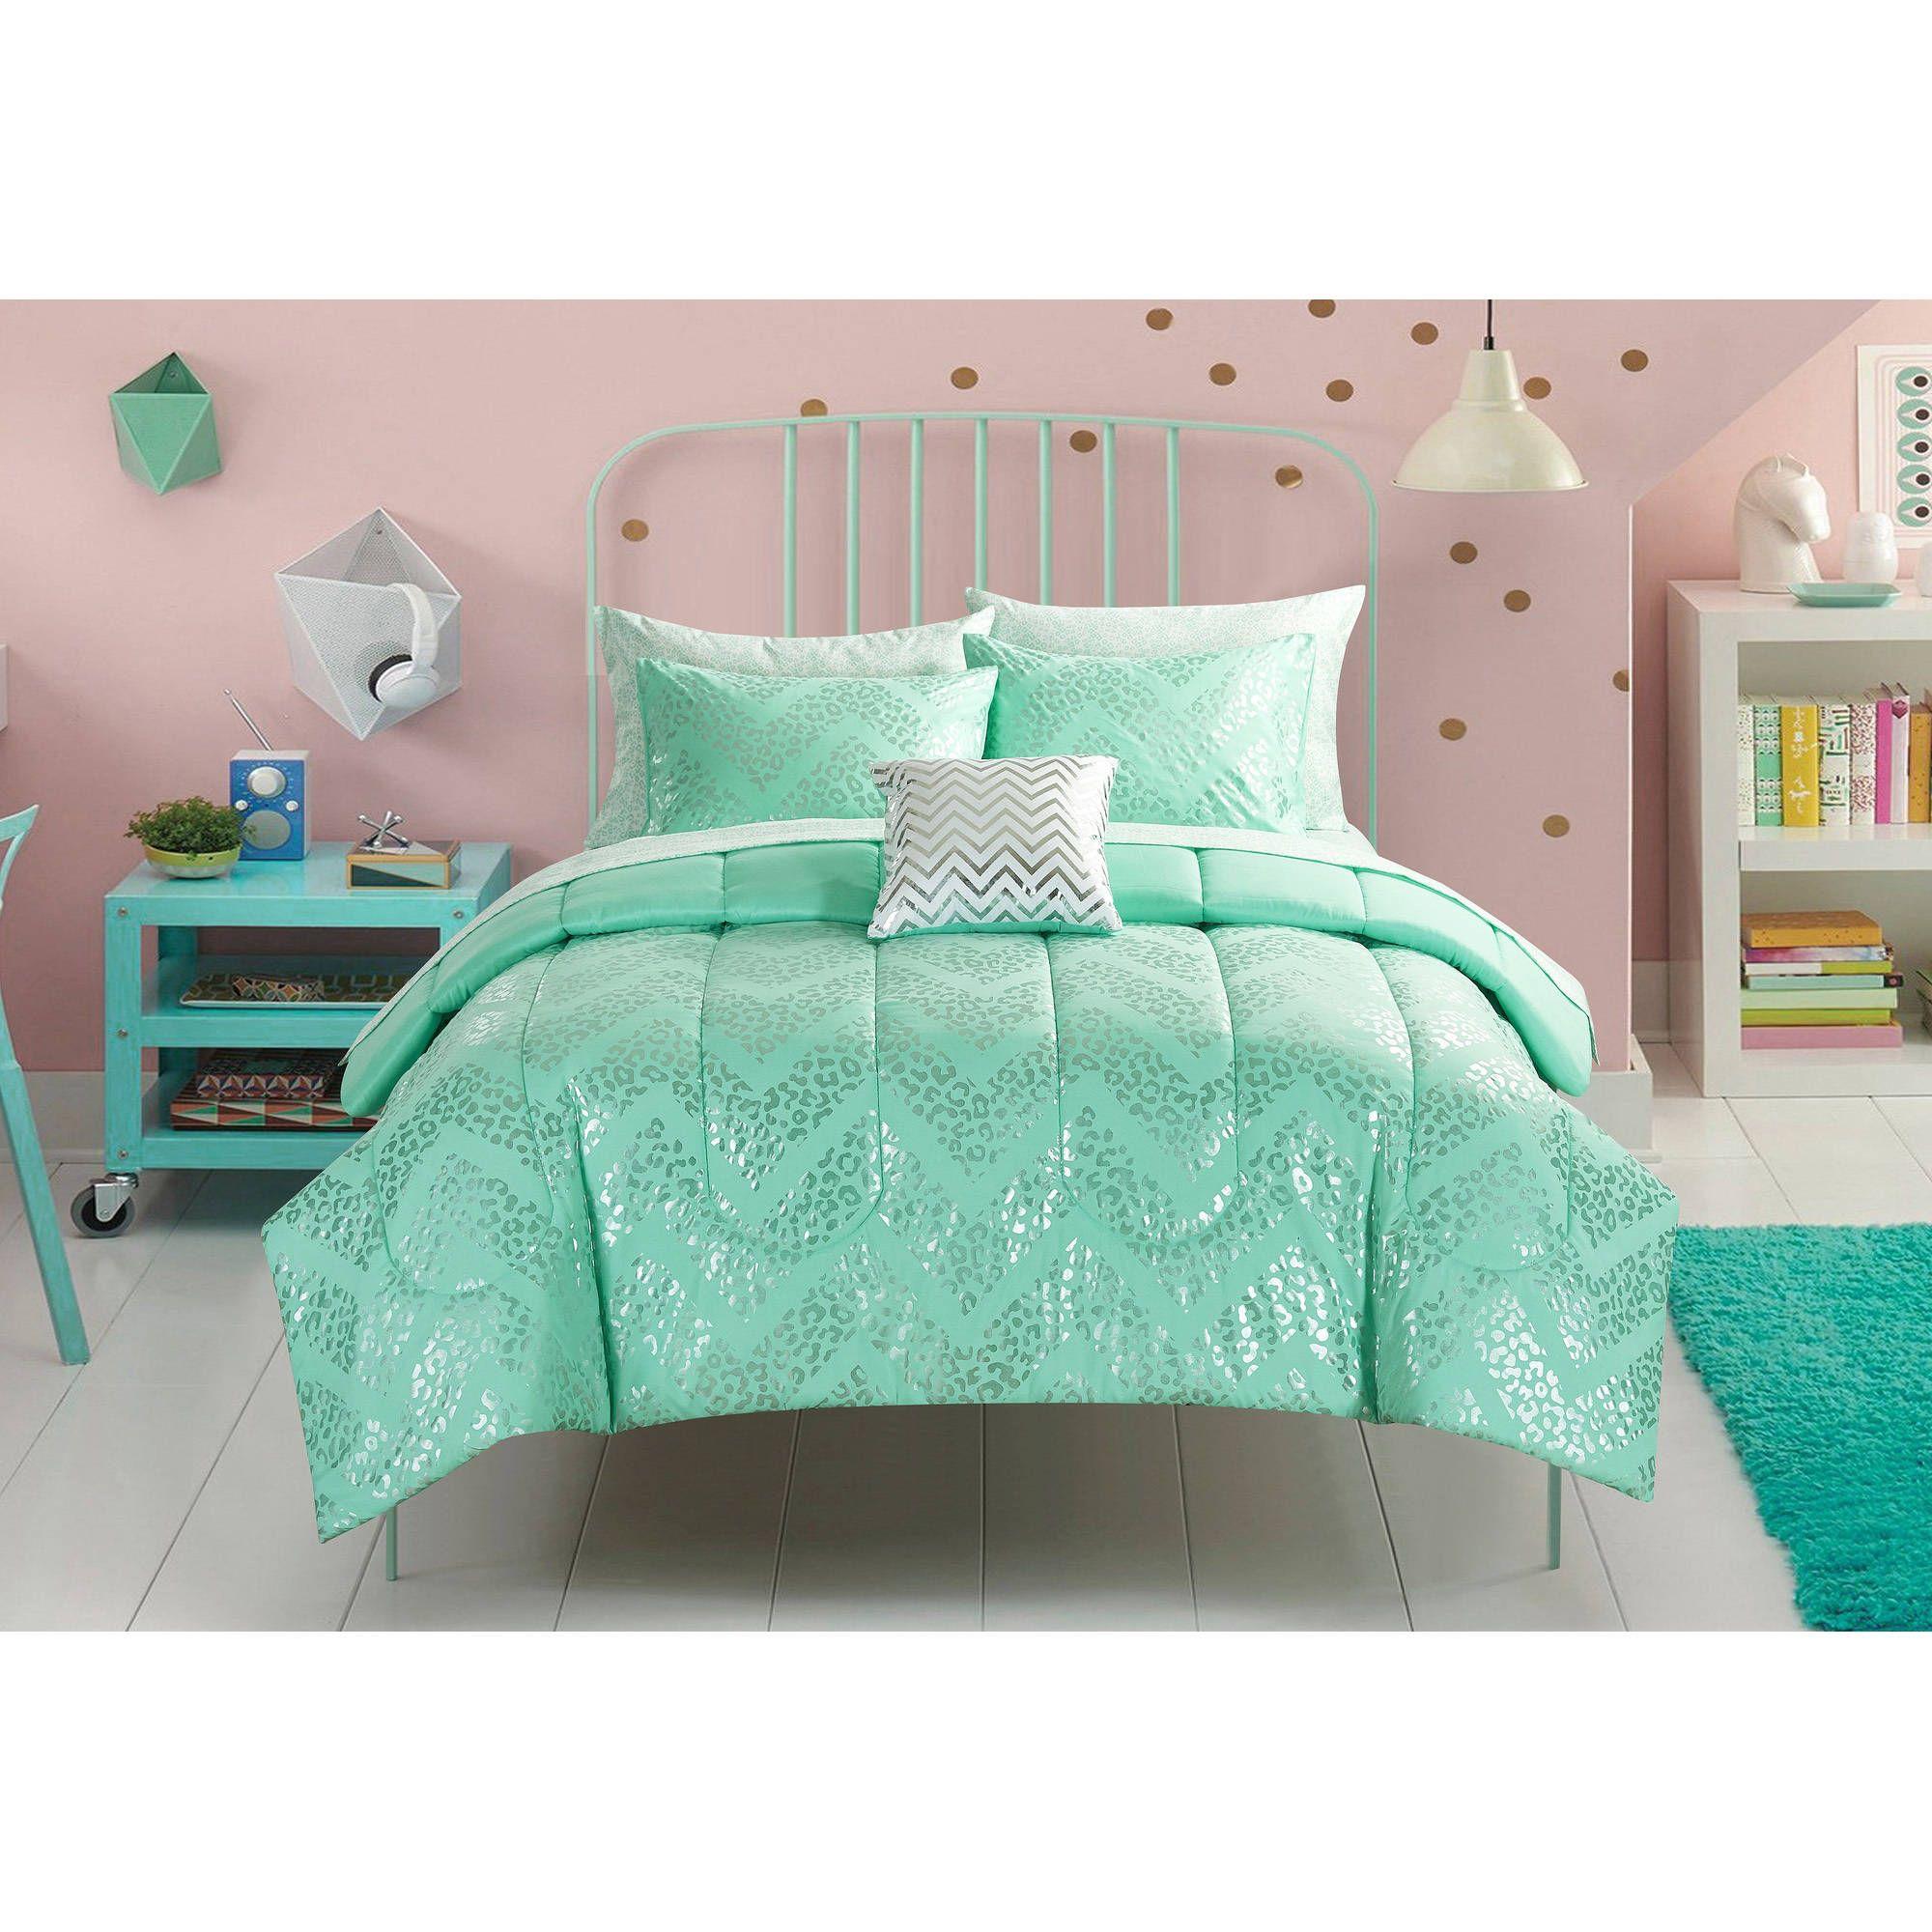 Mint Bedding Set